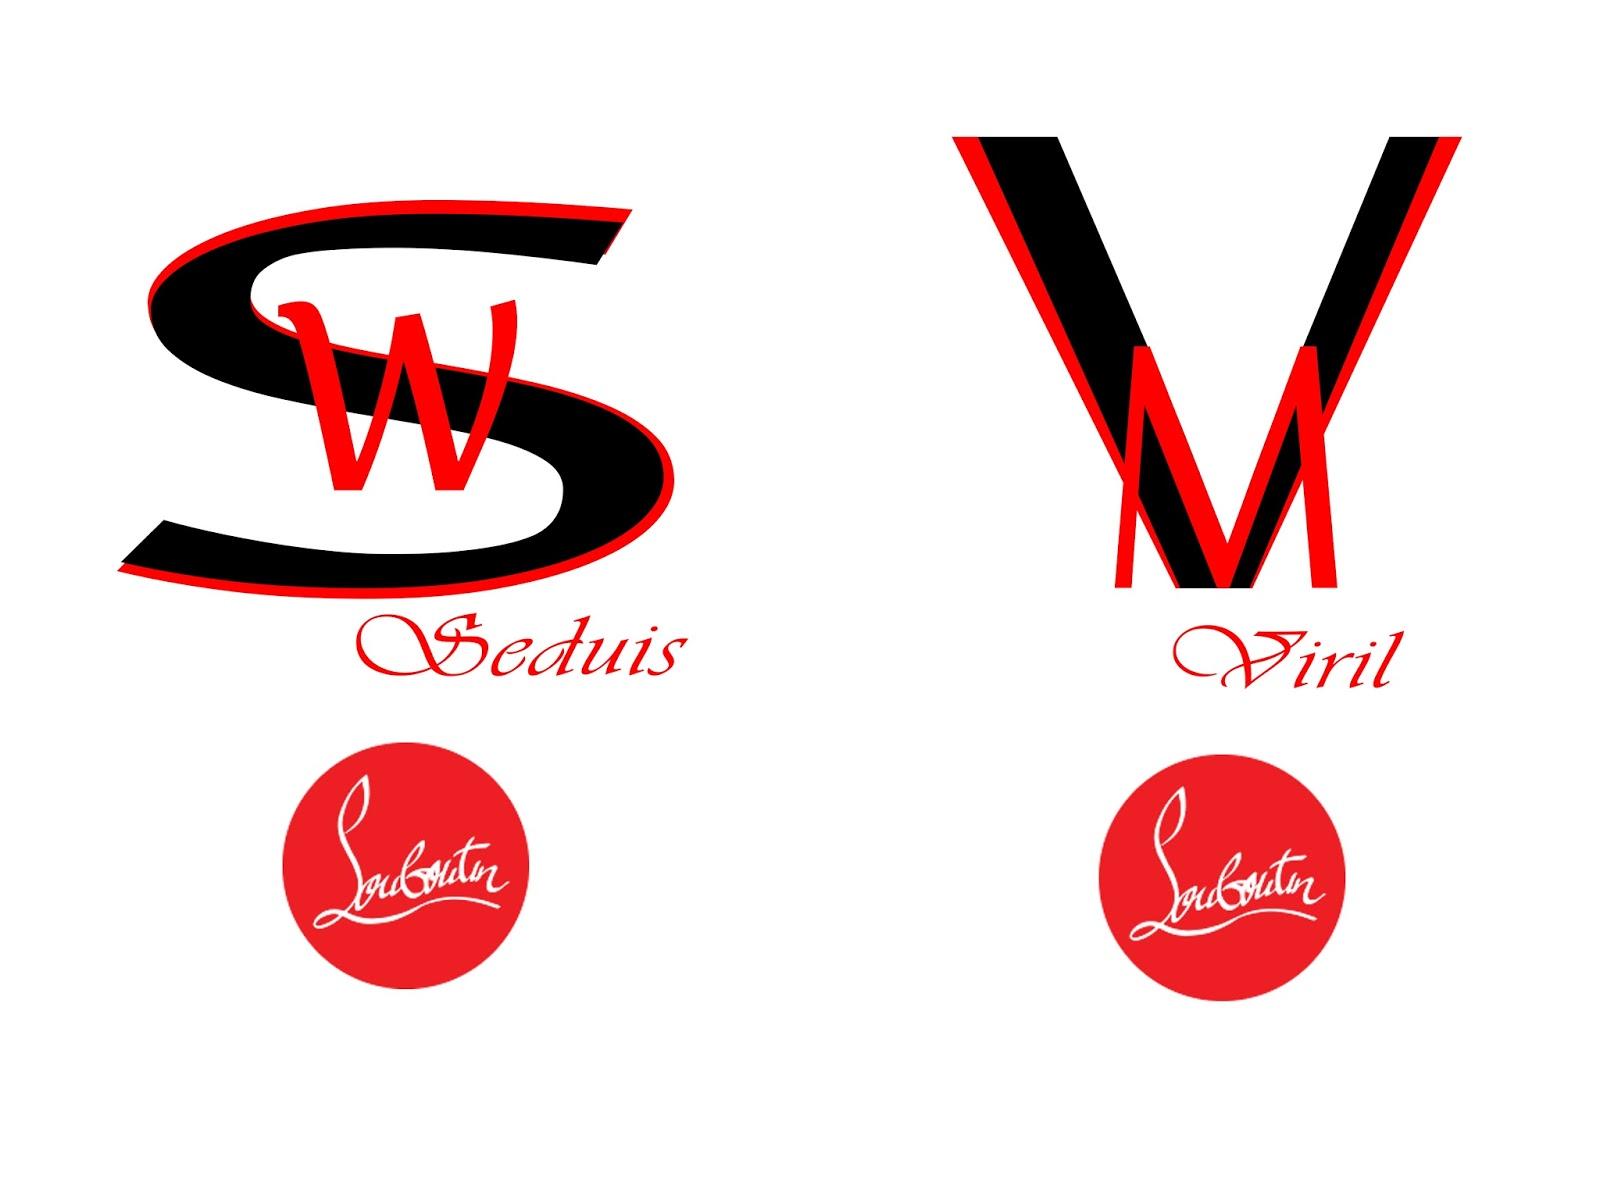 christian louboutin logo font - Bavilon Salon